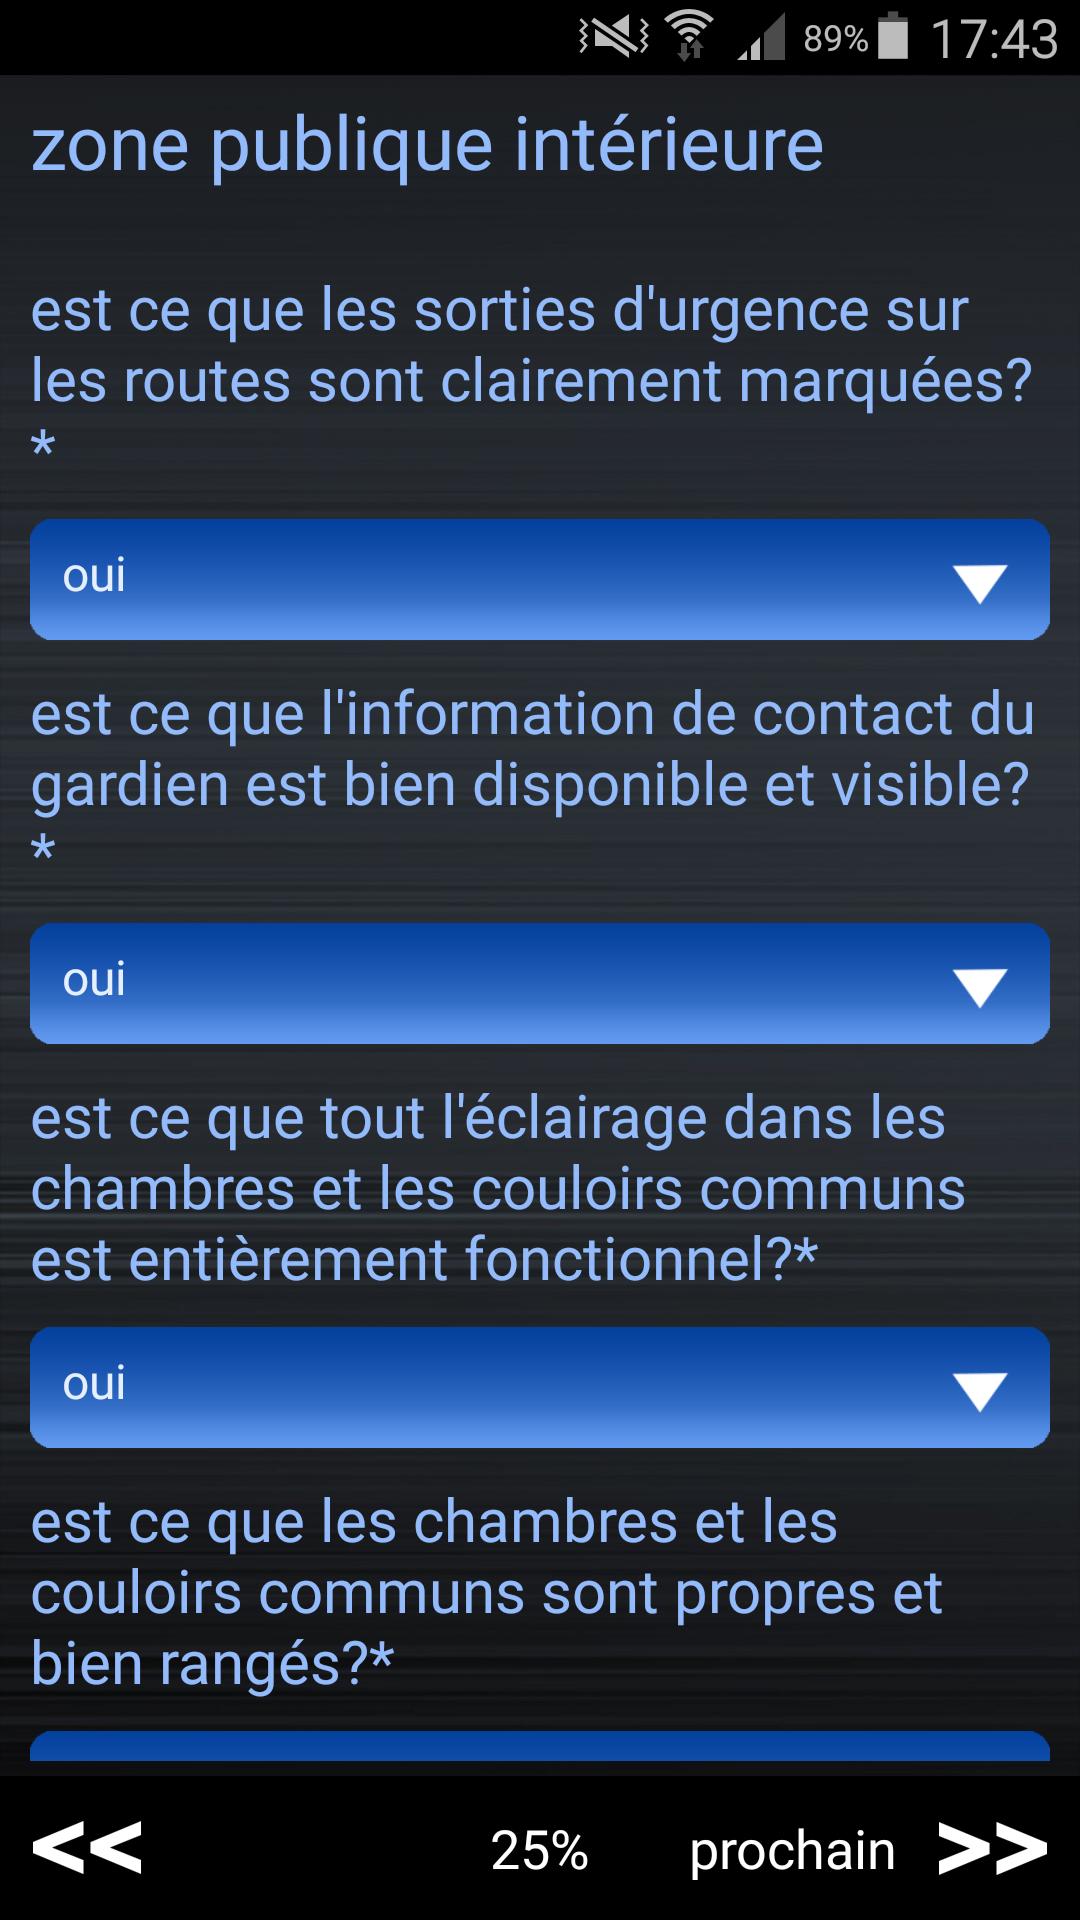 ginstr_app_buildingMaintenanceManagement_FR_6